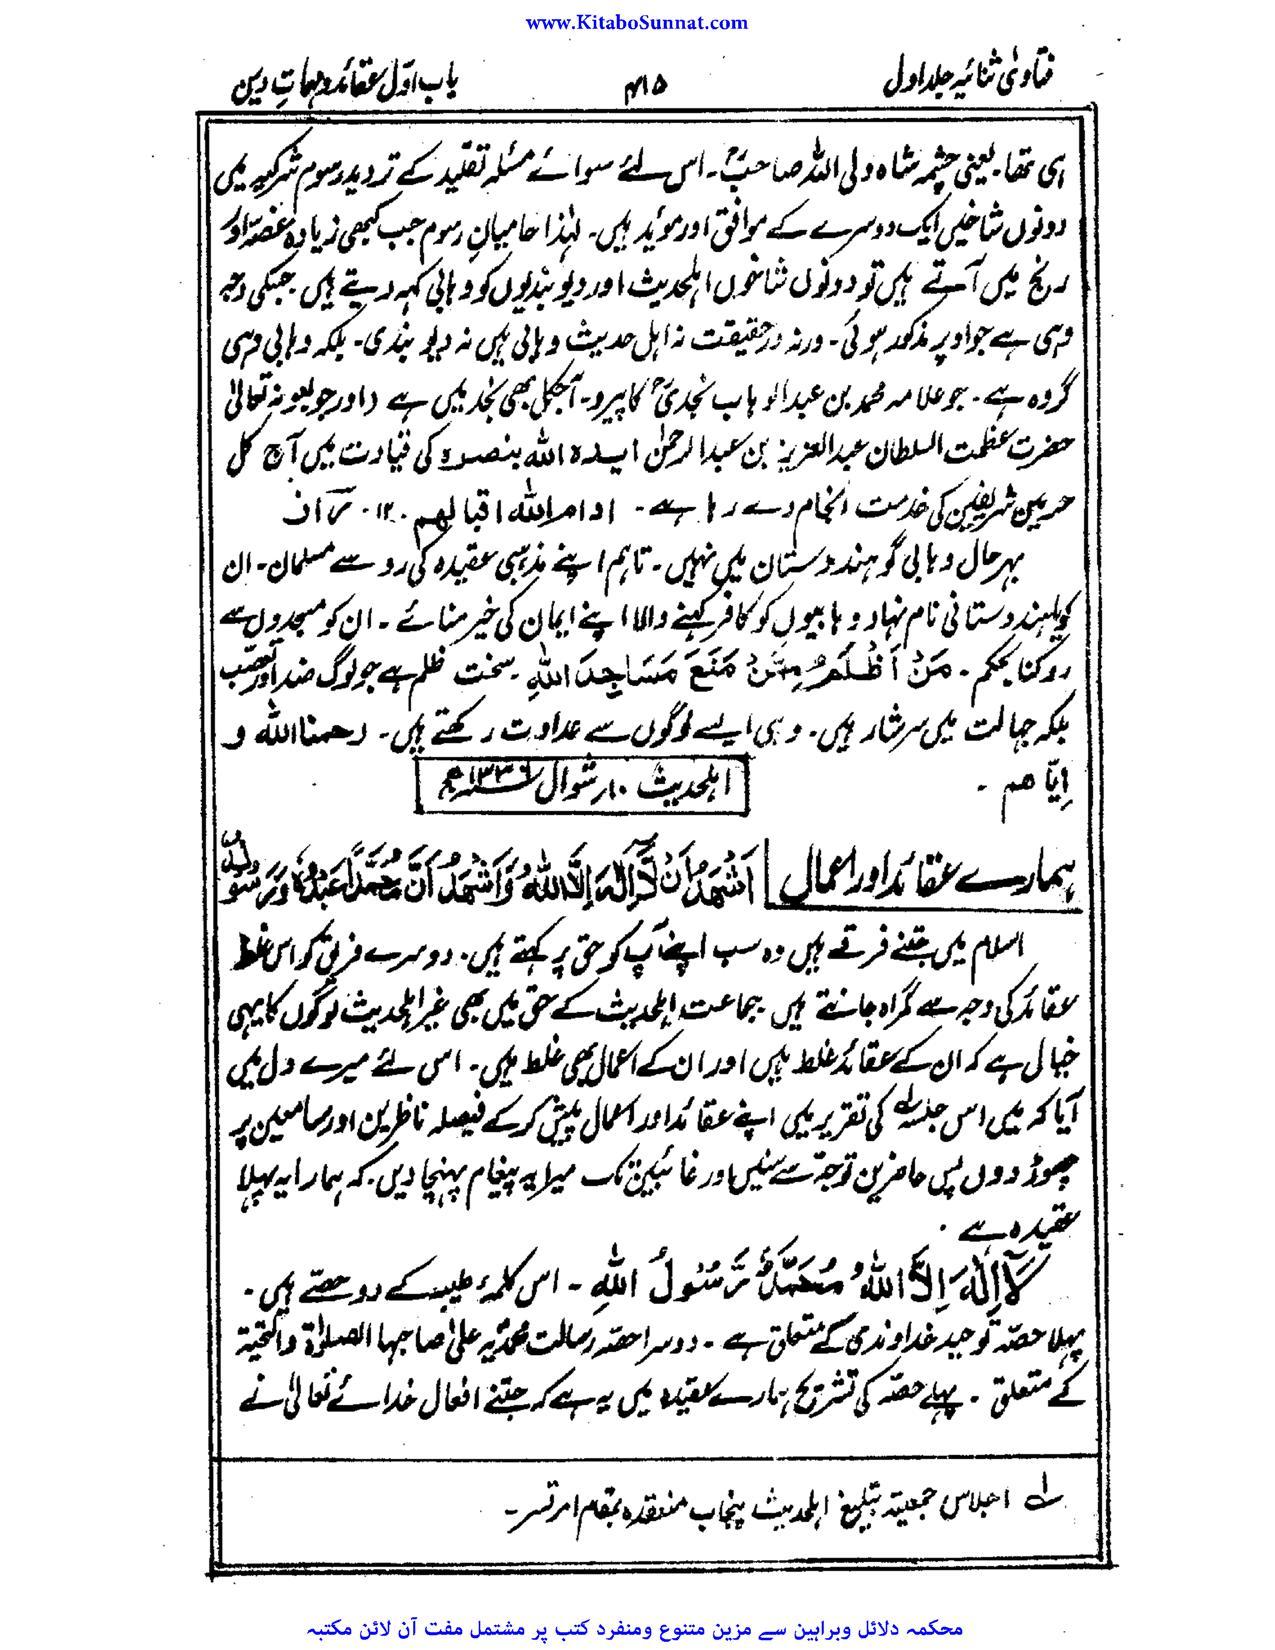 Wahabi Deobandi2.jpg